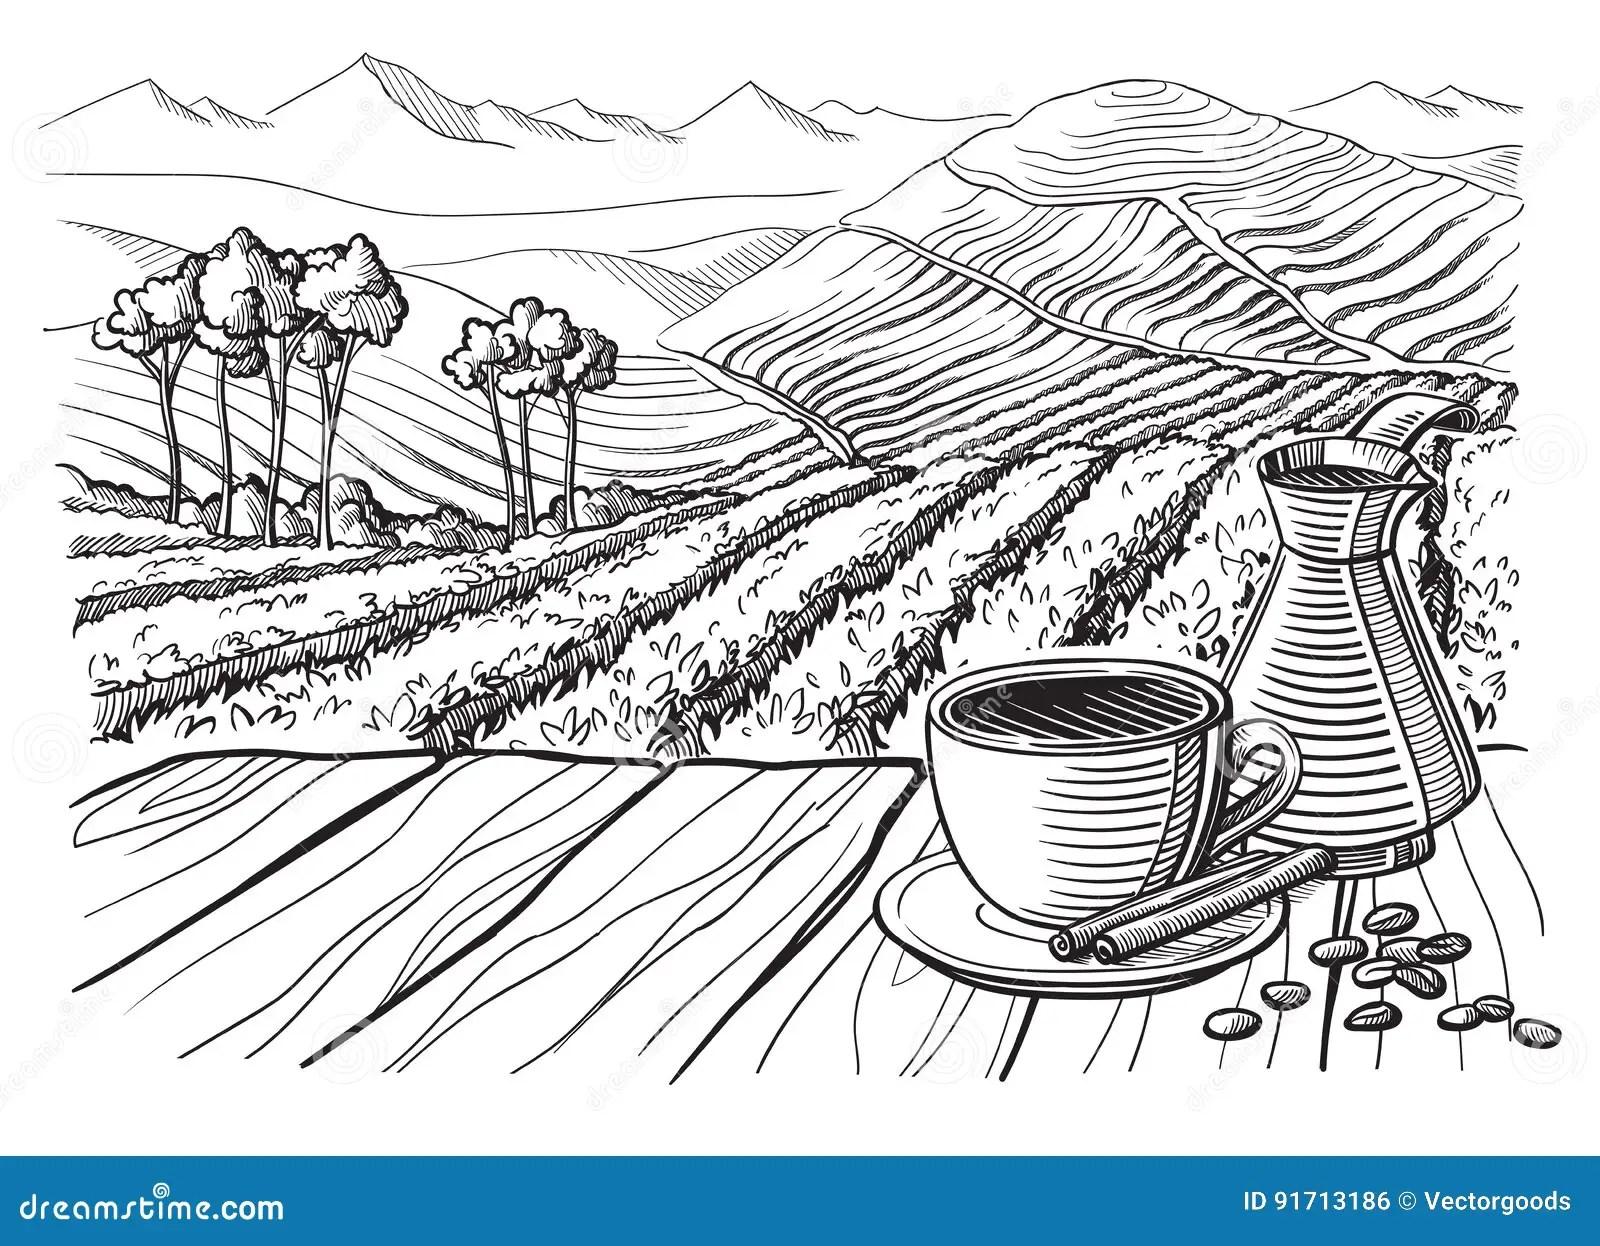 Coffee Plantation Landscape Vector Illustration